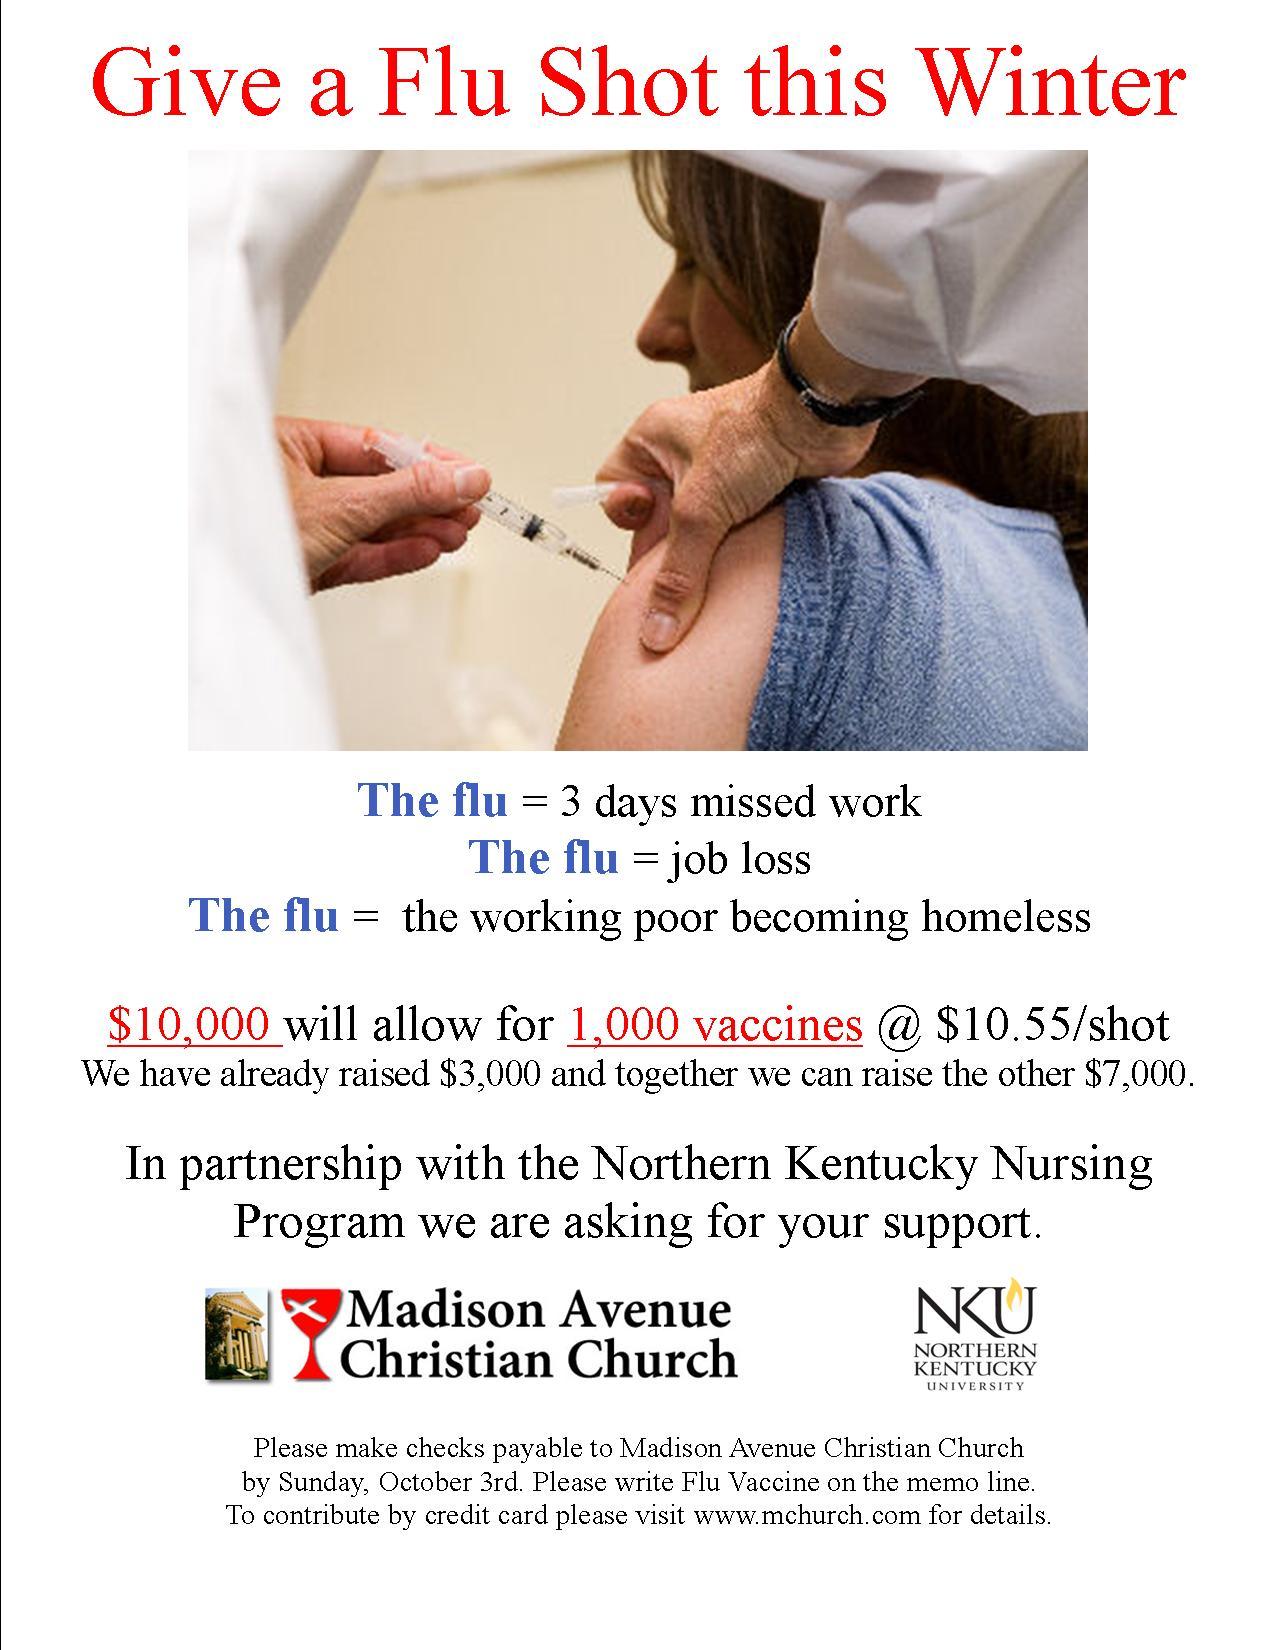 Flu Vaccine Flyers Free: Madison Avenue Christian Church